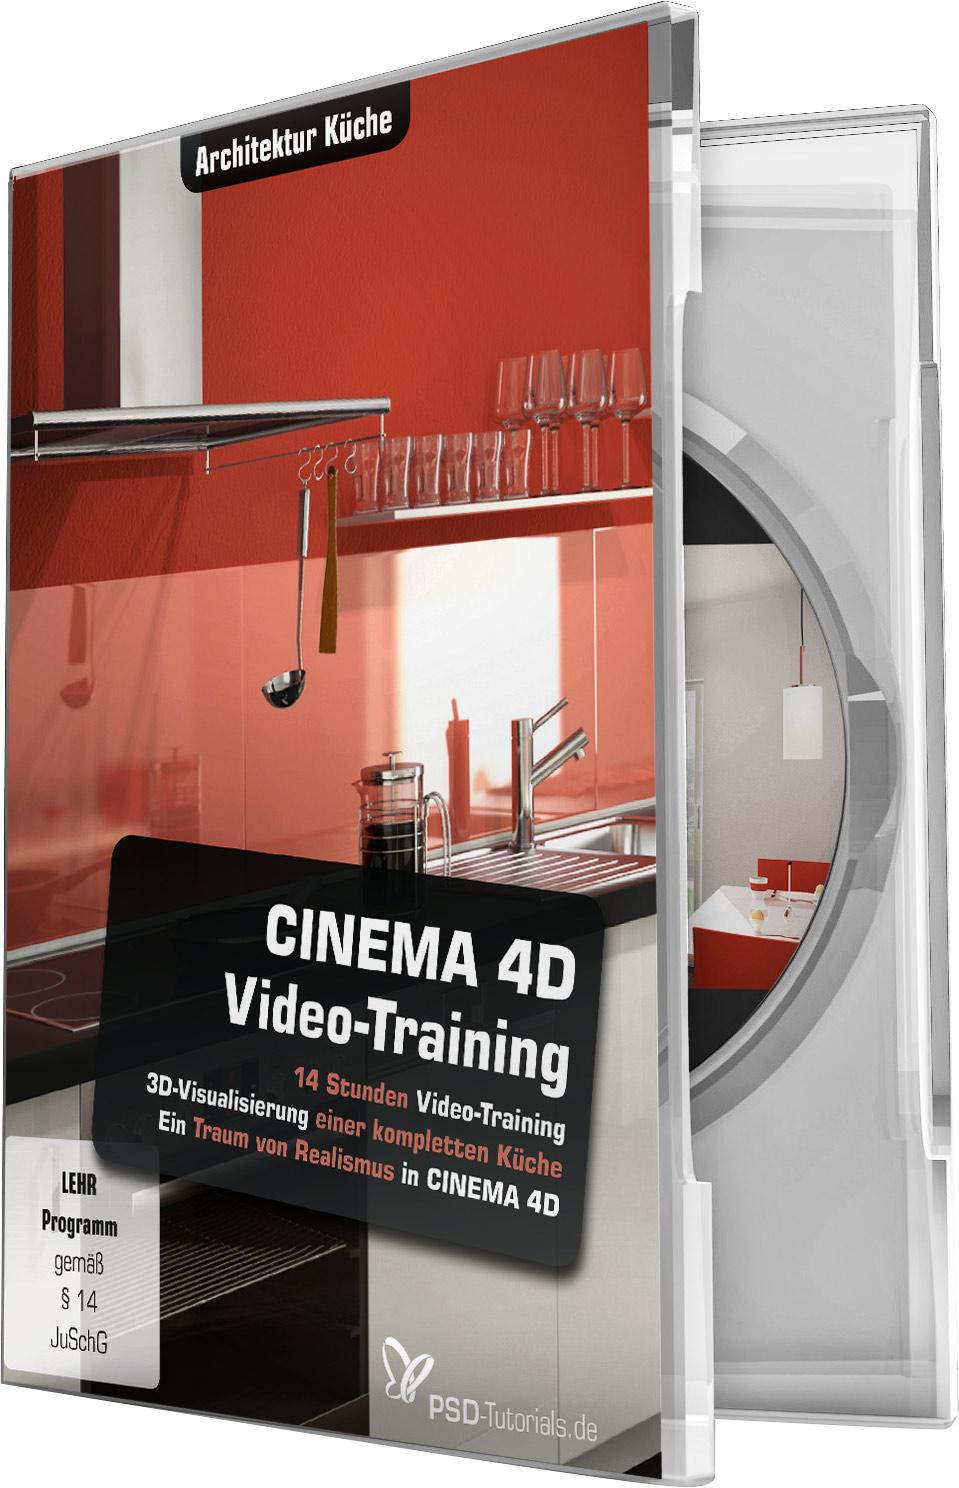 cinema 4d video training architektur k che psd shop. Black Bedroom Furniture Sets. Home Design Ideas